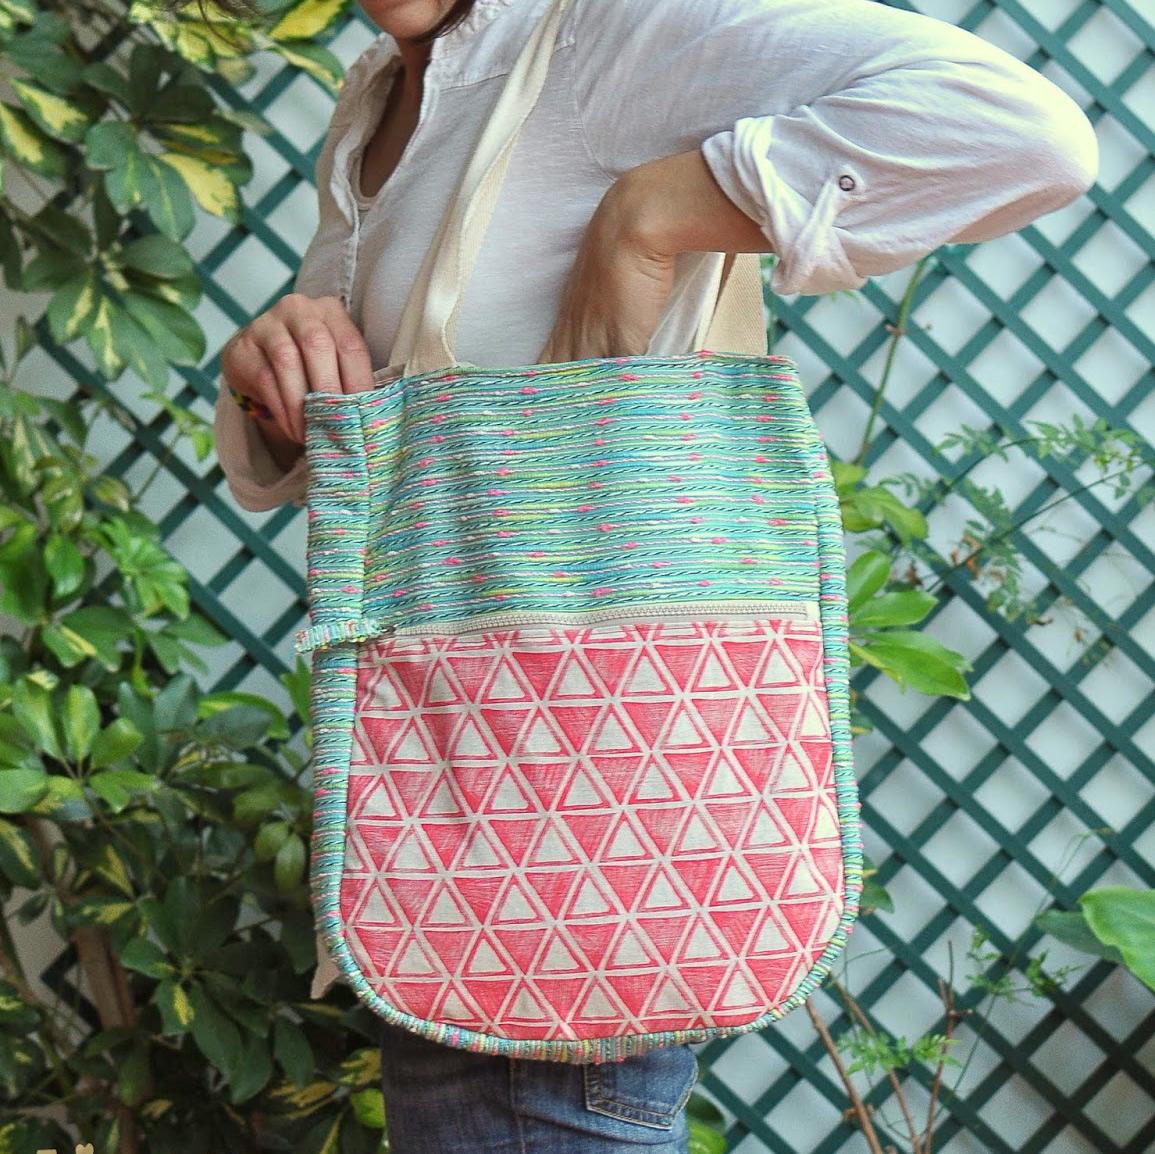 Summer Bag Sewing Tutorial